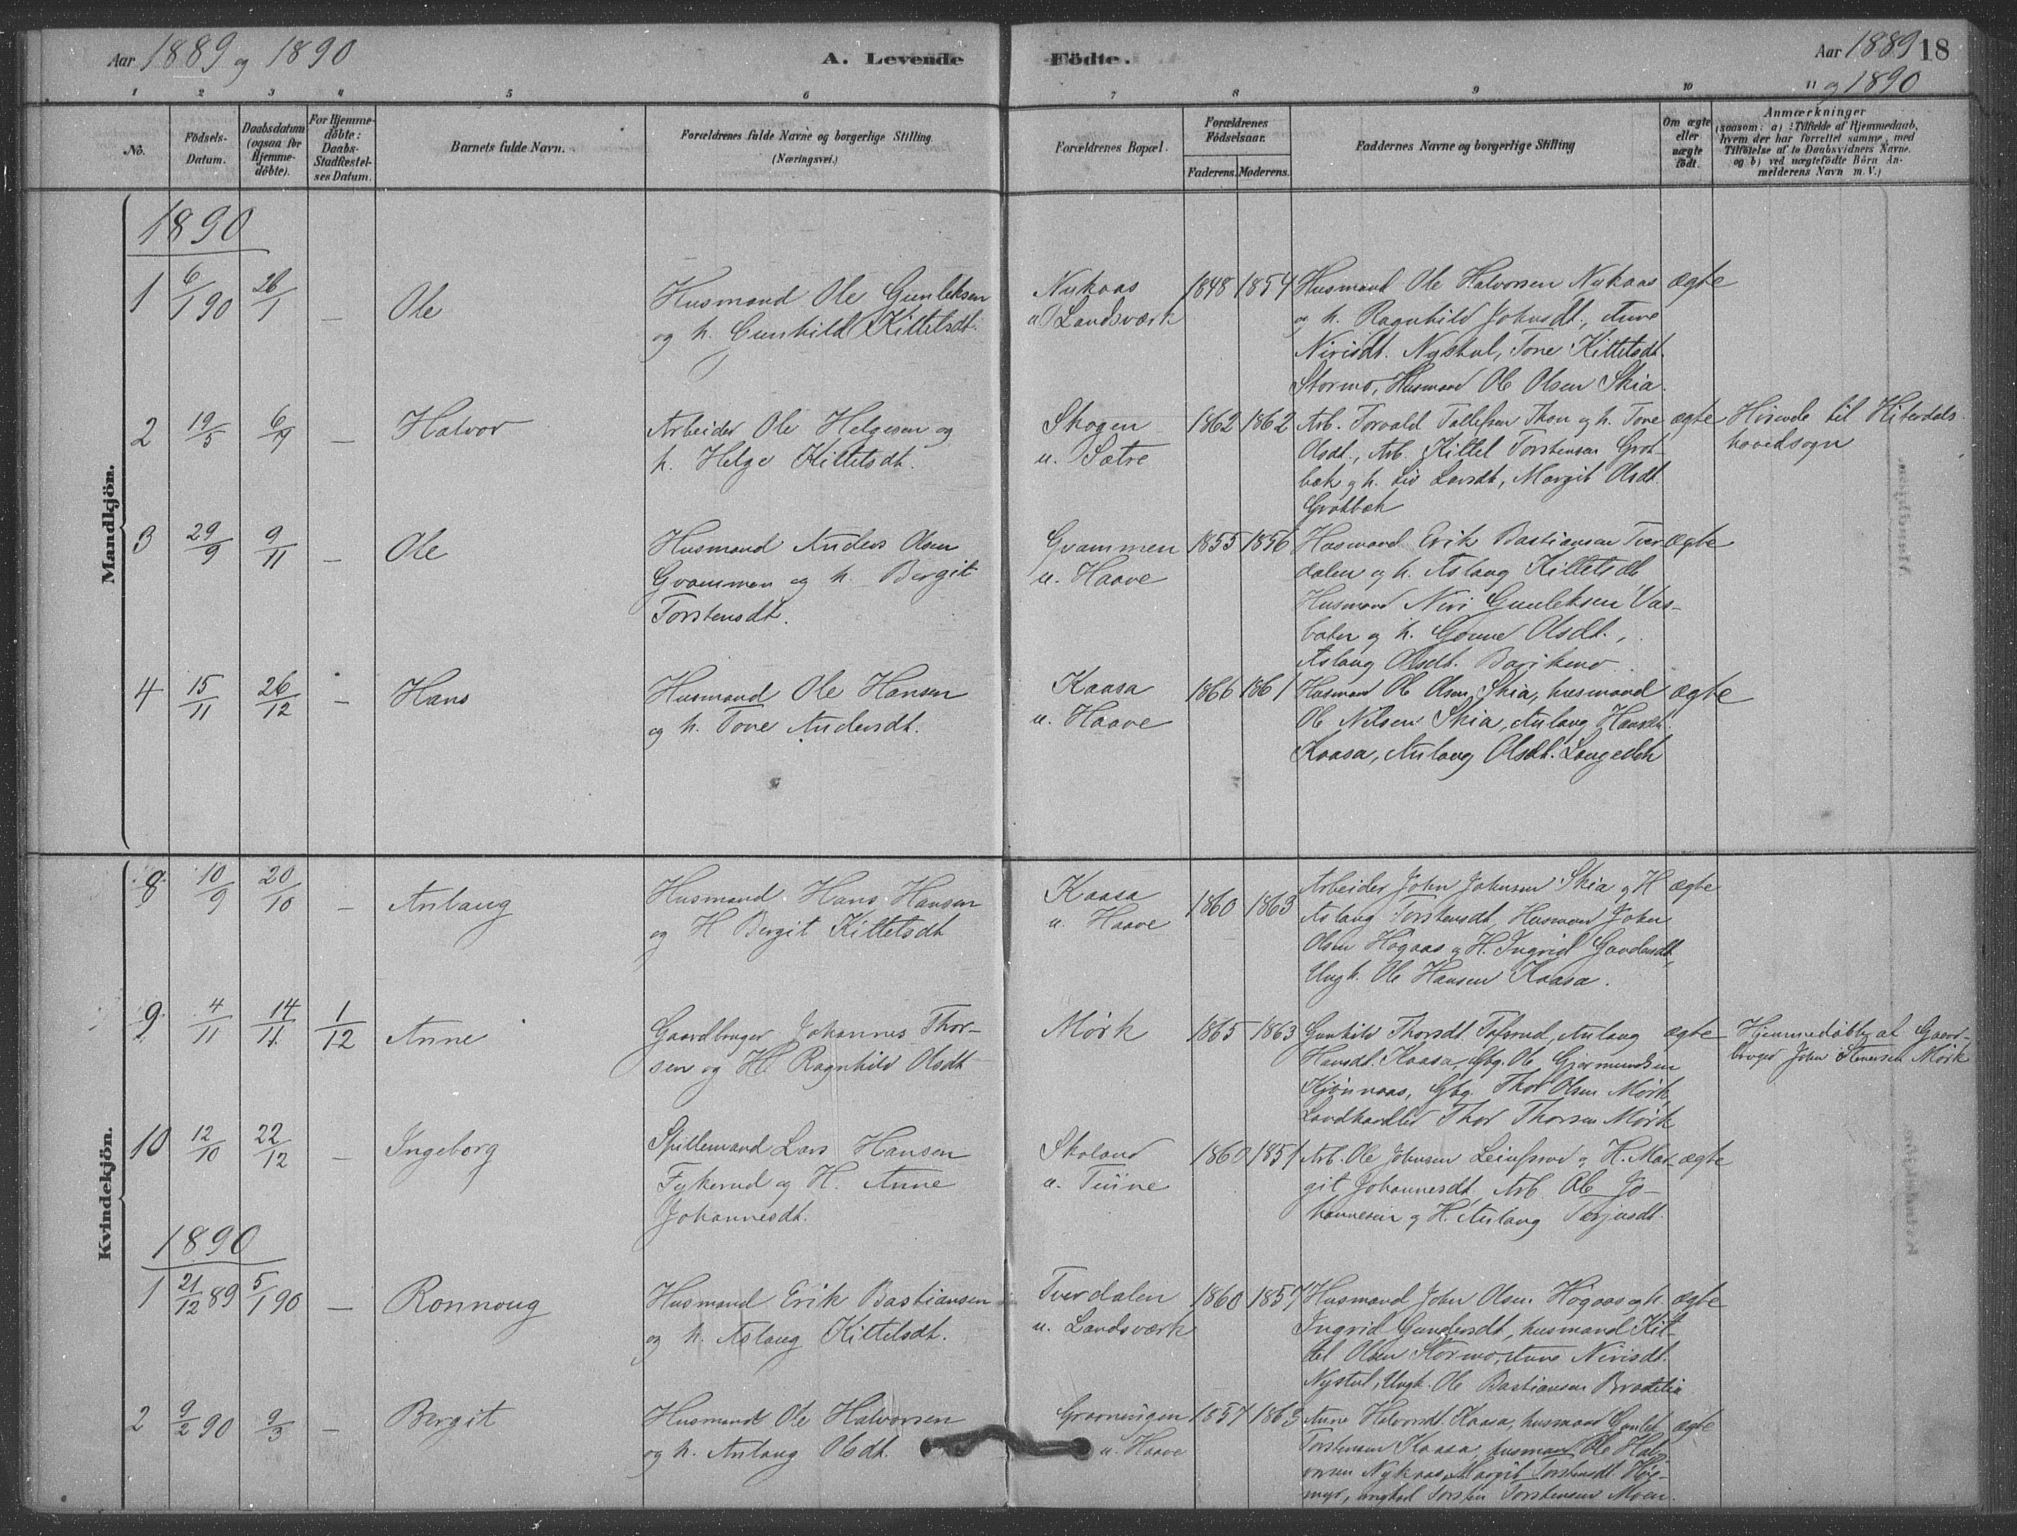 SAKO, Heddal kirkebøker, F/Fb/L0002: Ministerialbok nr. II 2, 1878-1913, s. 18